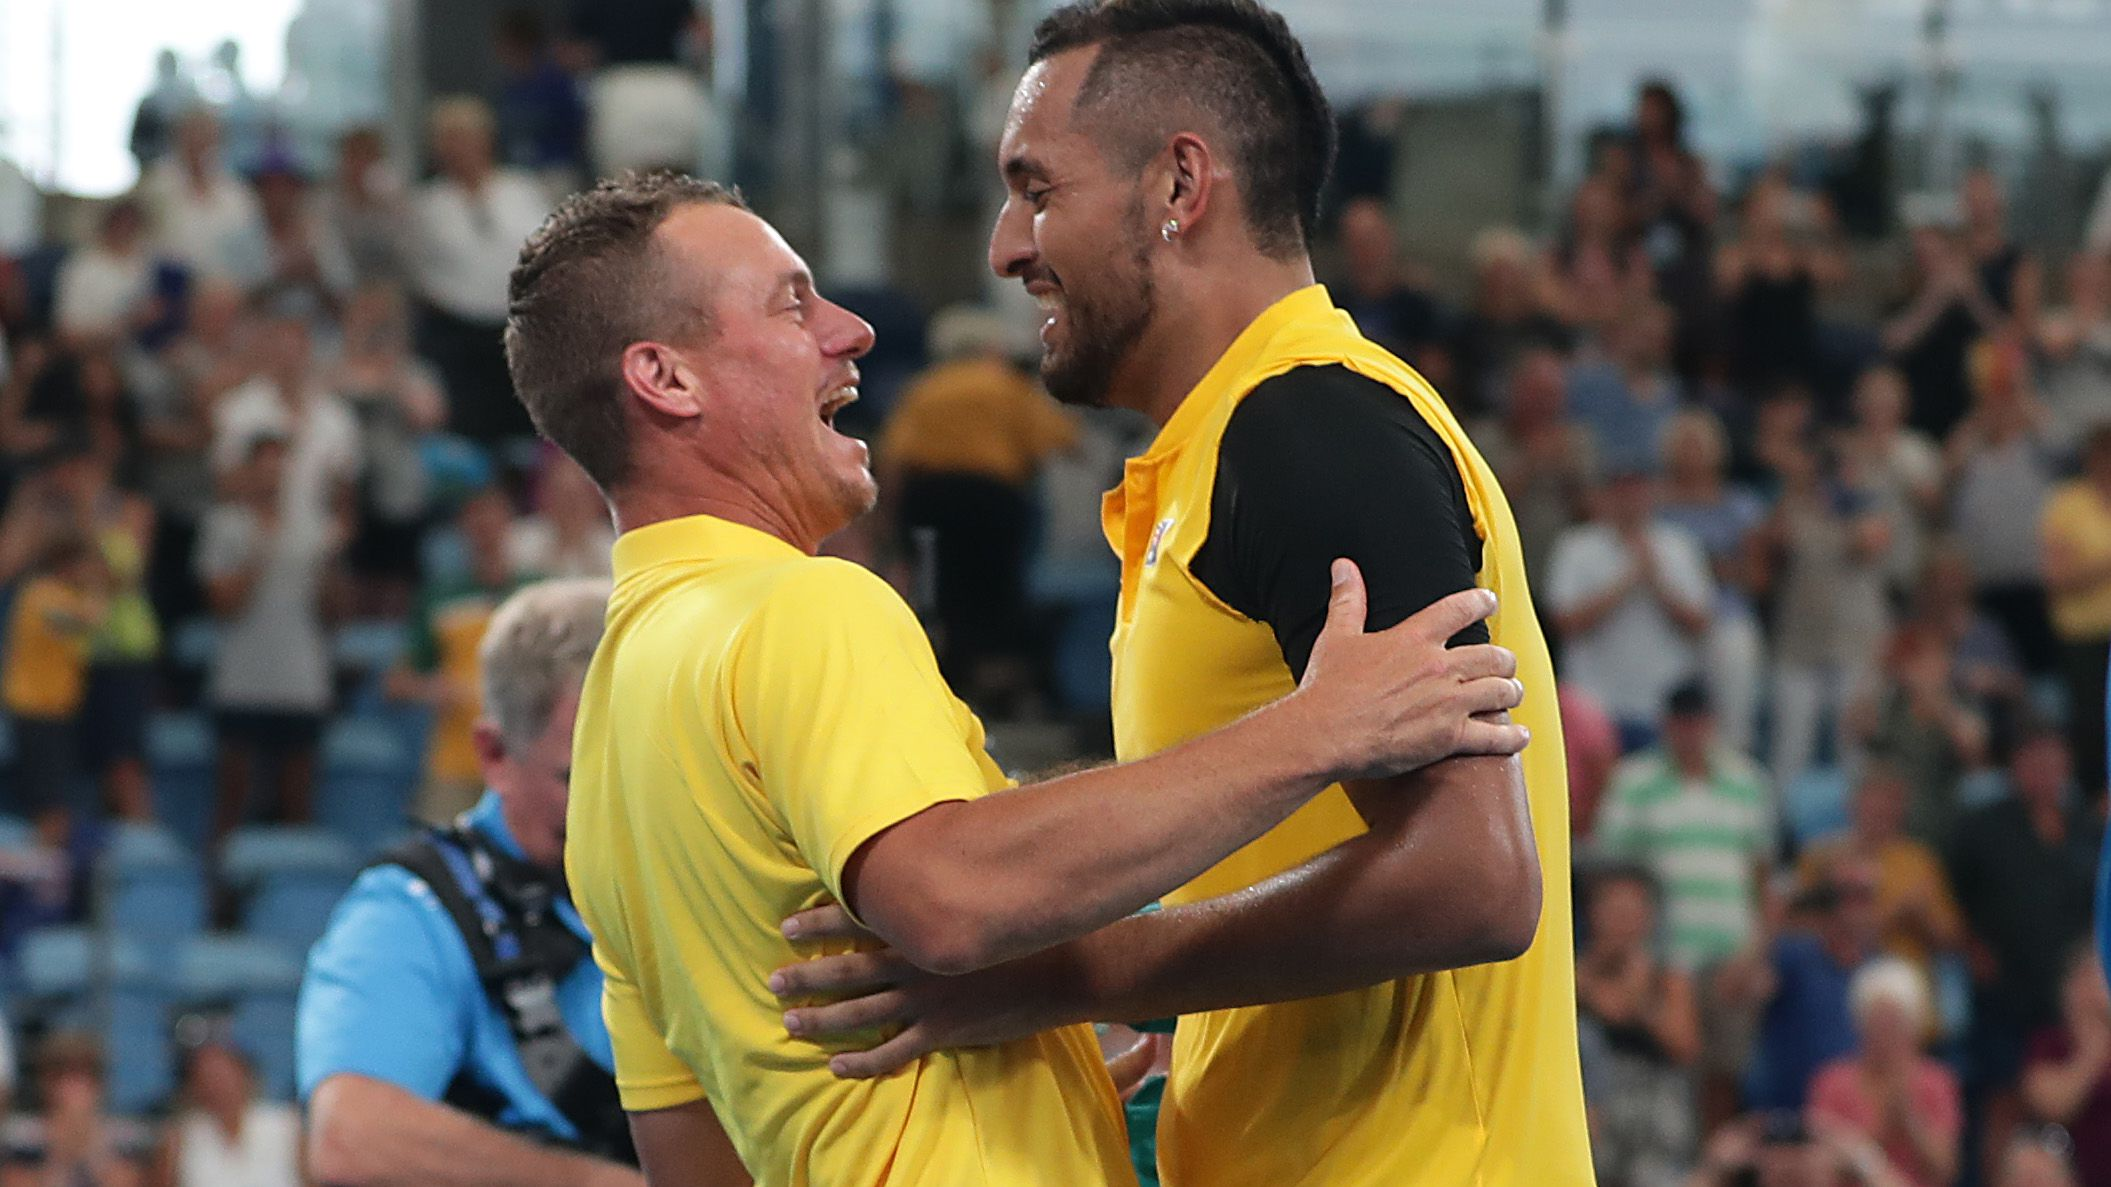 ATP Cup to return as Tennis Australia unveils full 2021 summer of tennis schedule